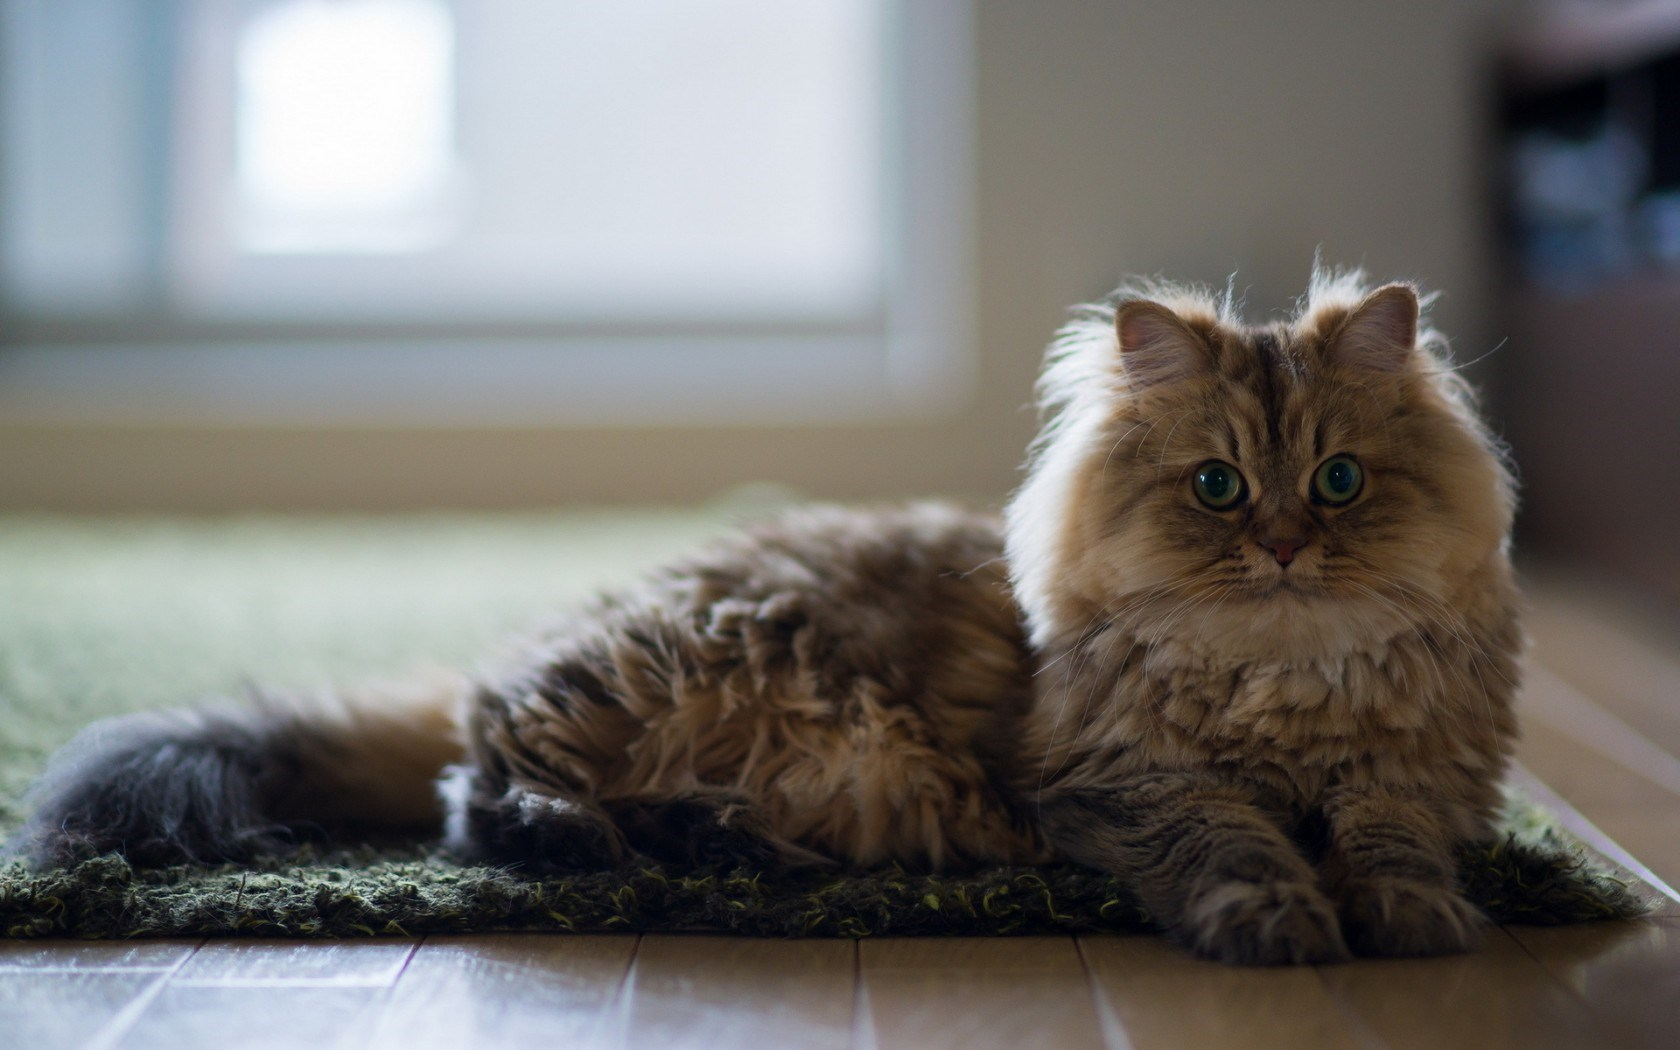 Cute Bengal Cats Wallpaper Cat Floor Hd Desktop Wallpapers 4k Hd